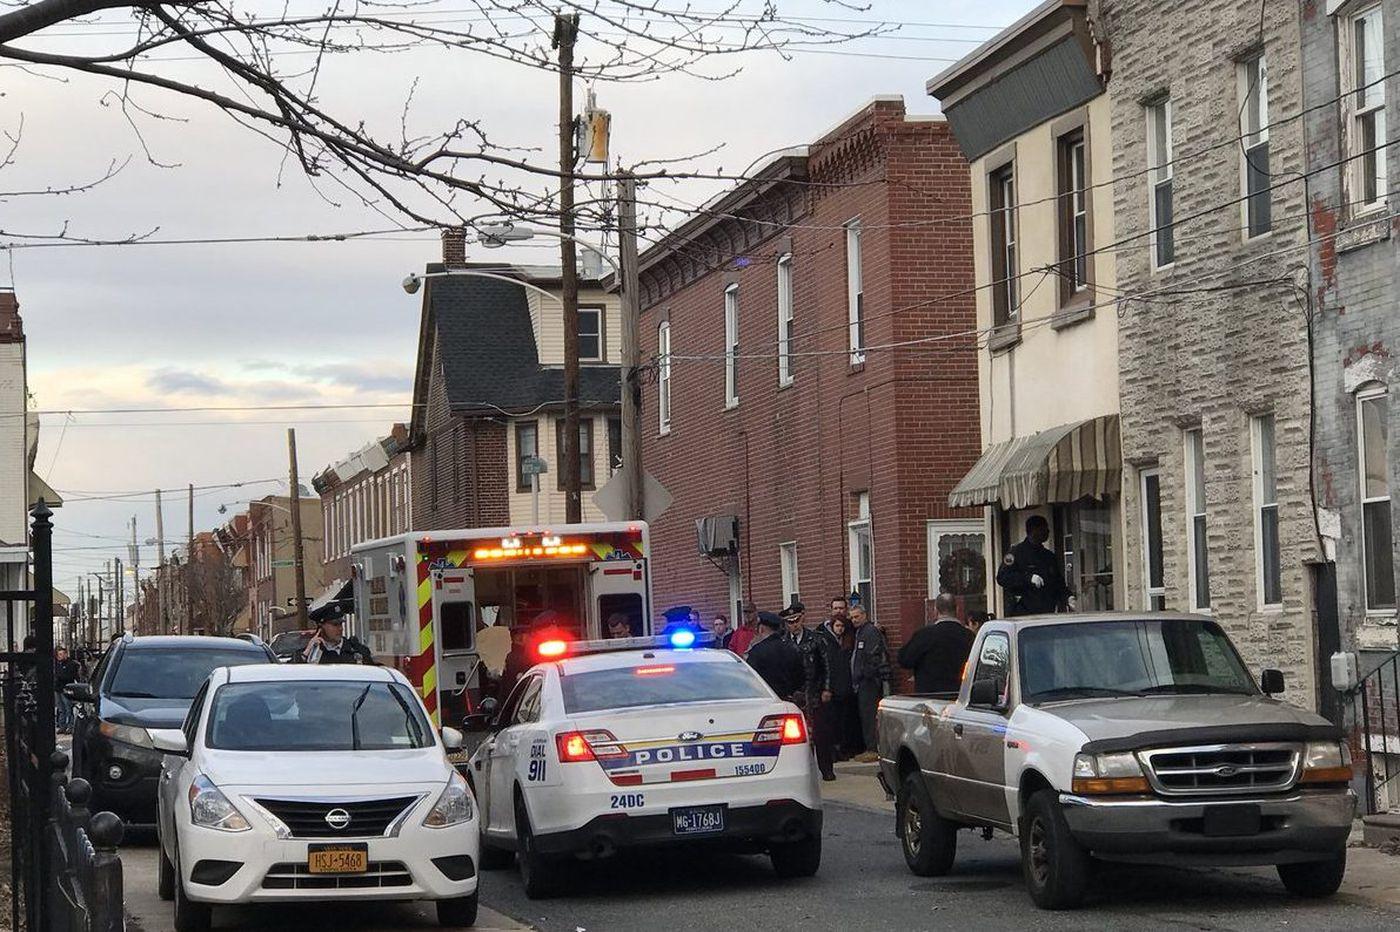 Female police officer, man found dead in Port Richmond home